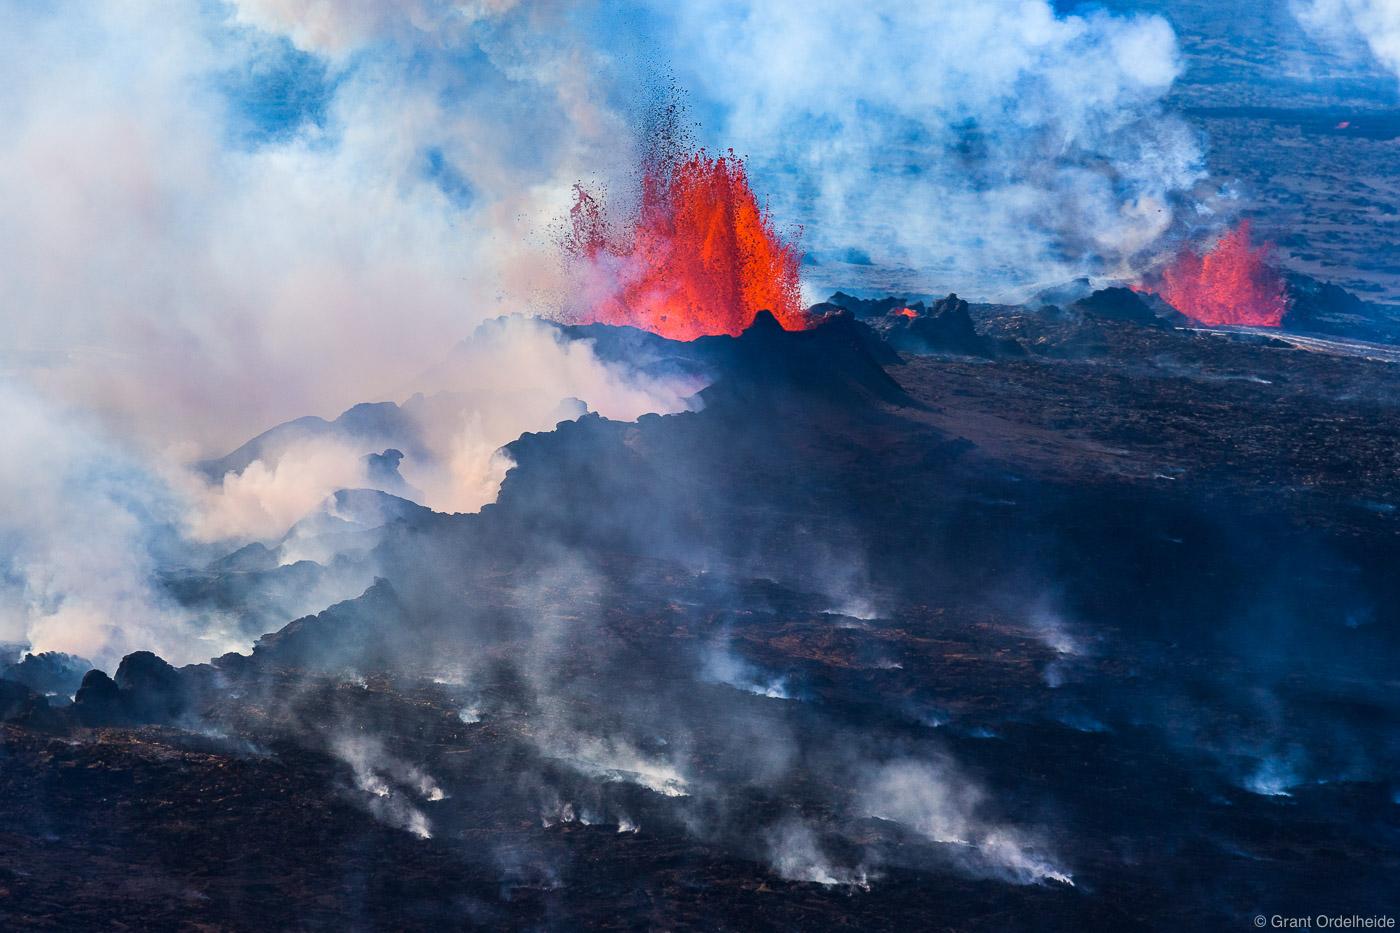 lava, hot, fields, vatnajökull, iceland, eruption, steam, fissure, bardarbunga, volcano, holuhraun, , photo